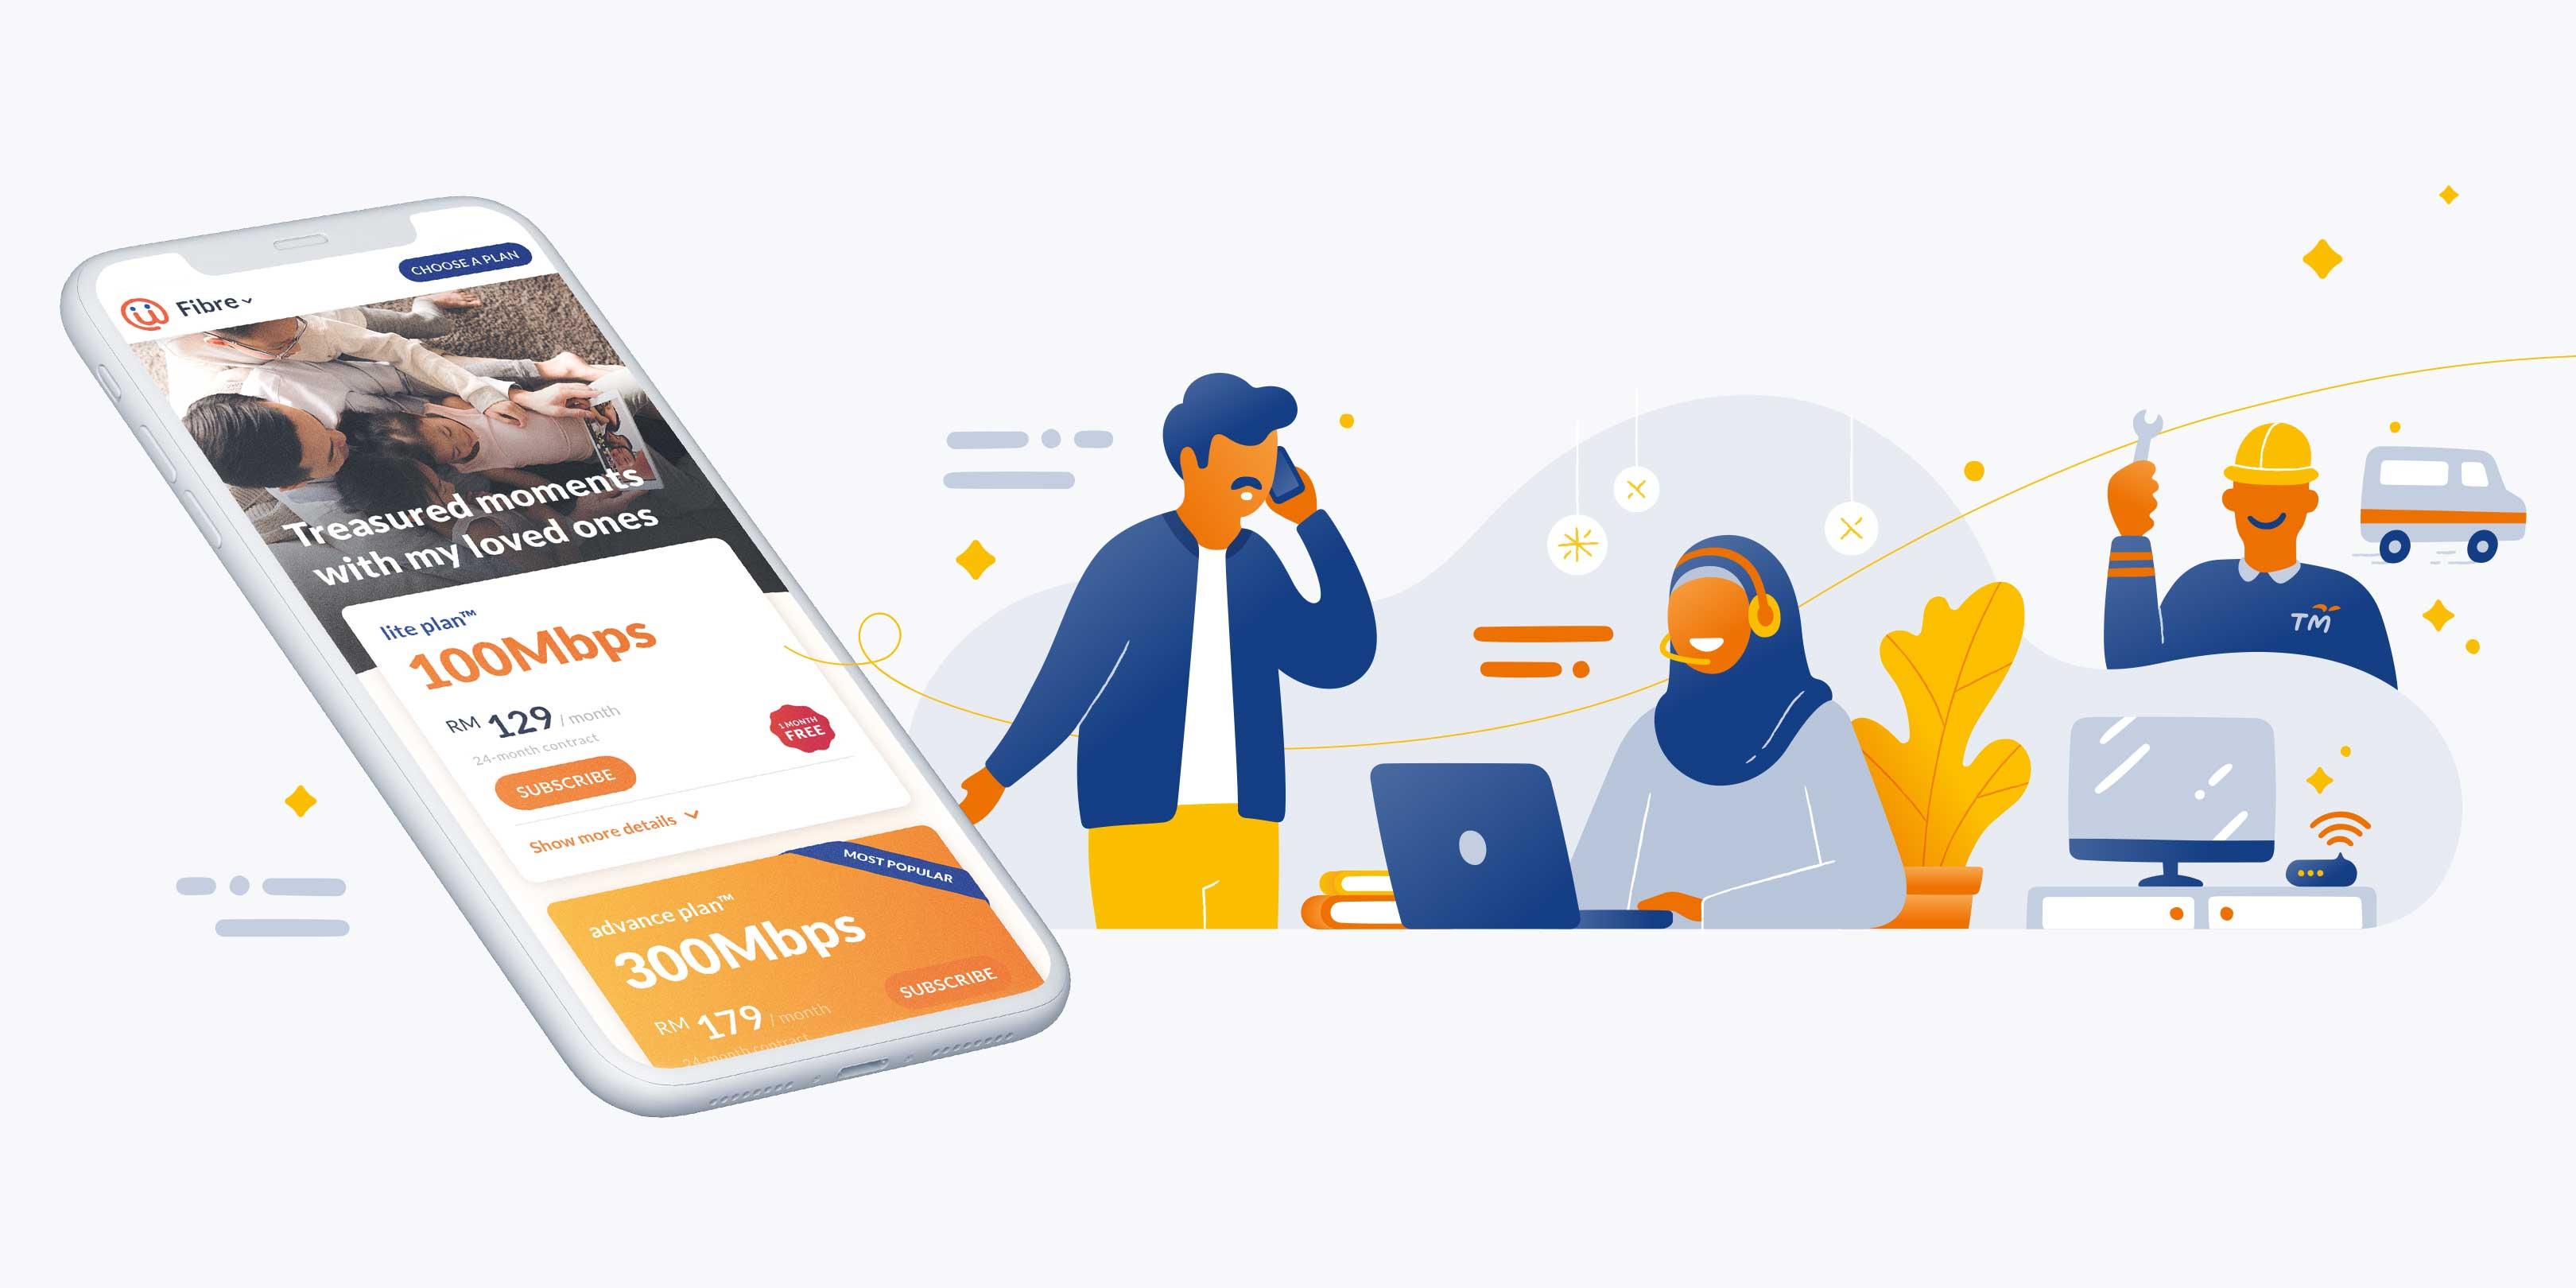 Unifi – Redefine The Brand Commerce